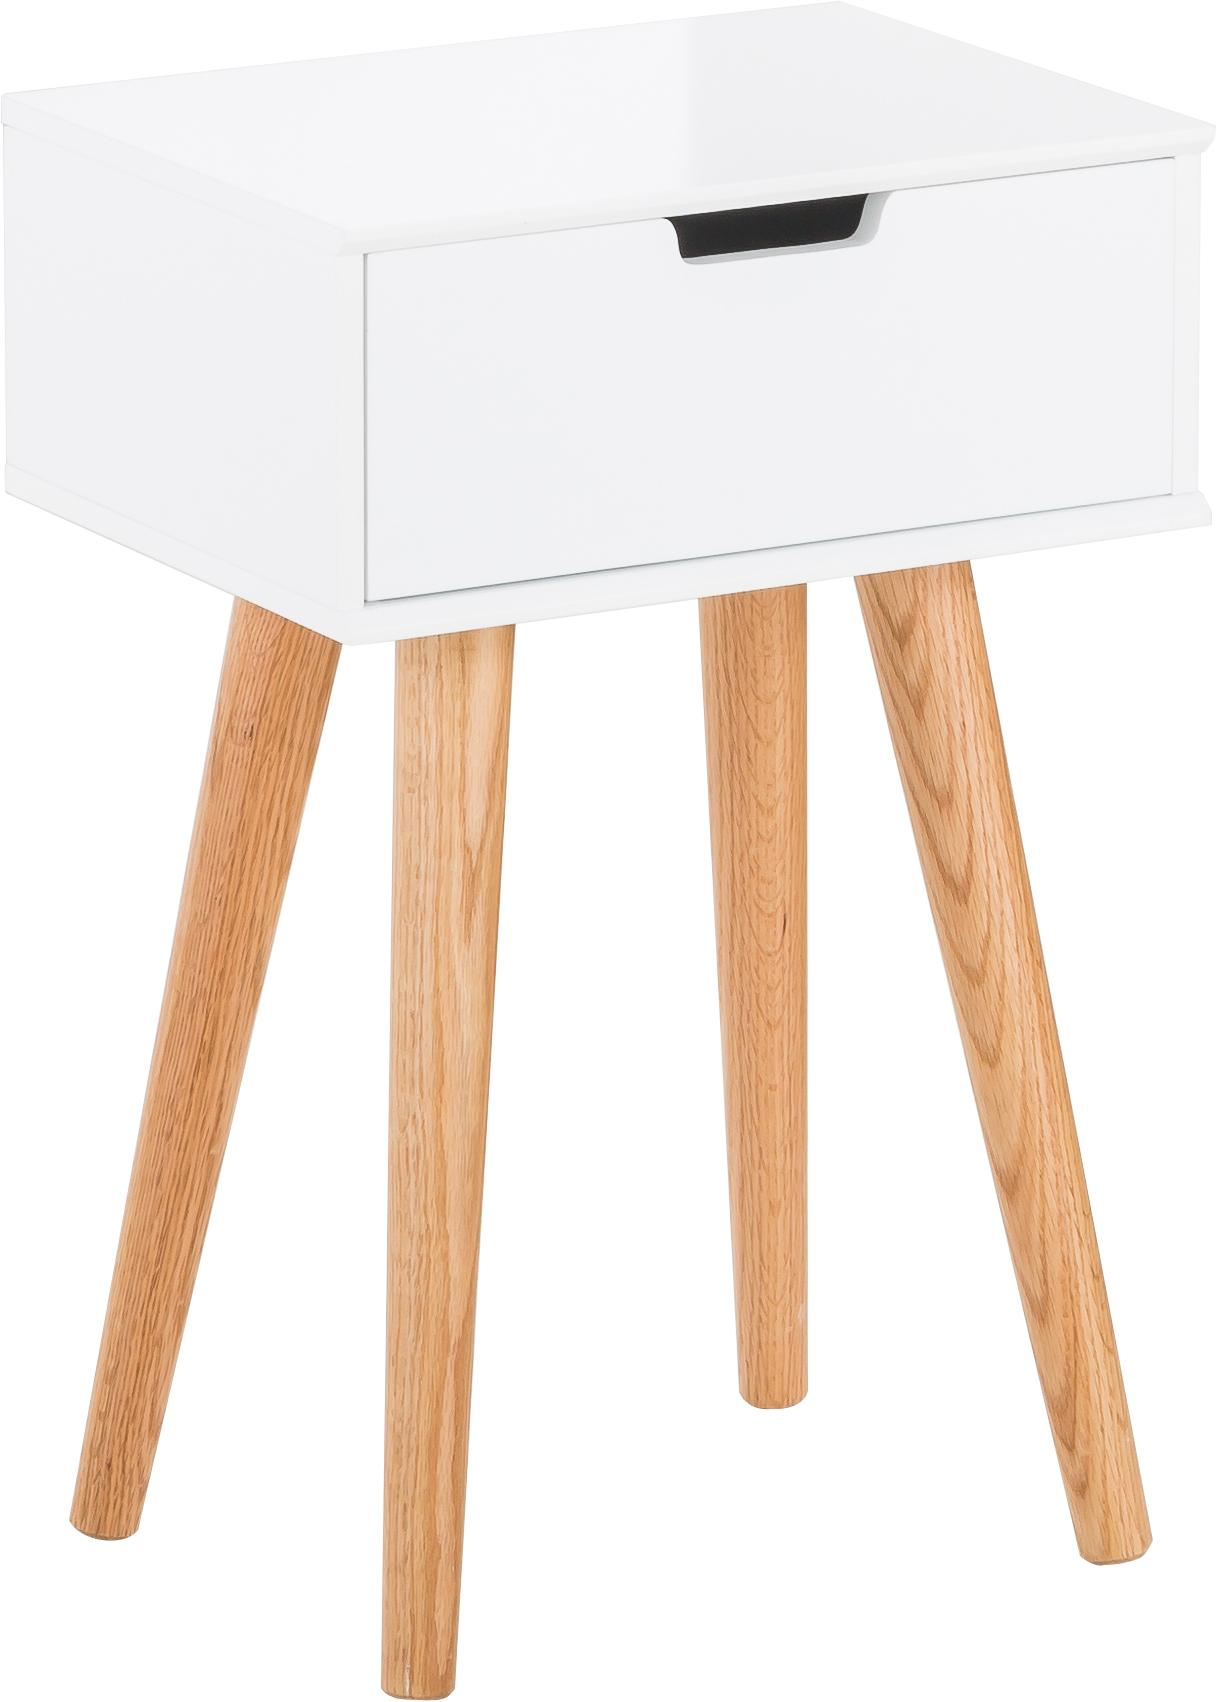 Mesilla de noche Mitra, Patas: madera de roble, Estructura: tablero de fibras de dens, Roble, blanco, An 40 x Al 62 cm